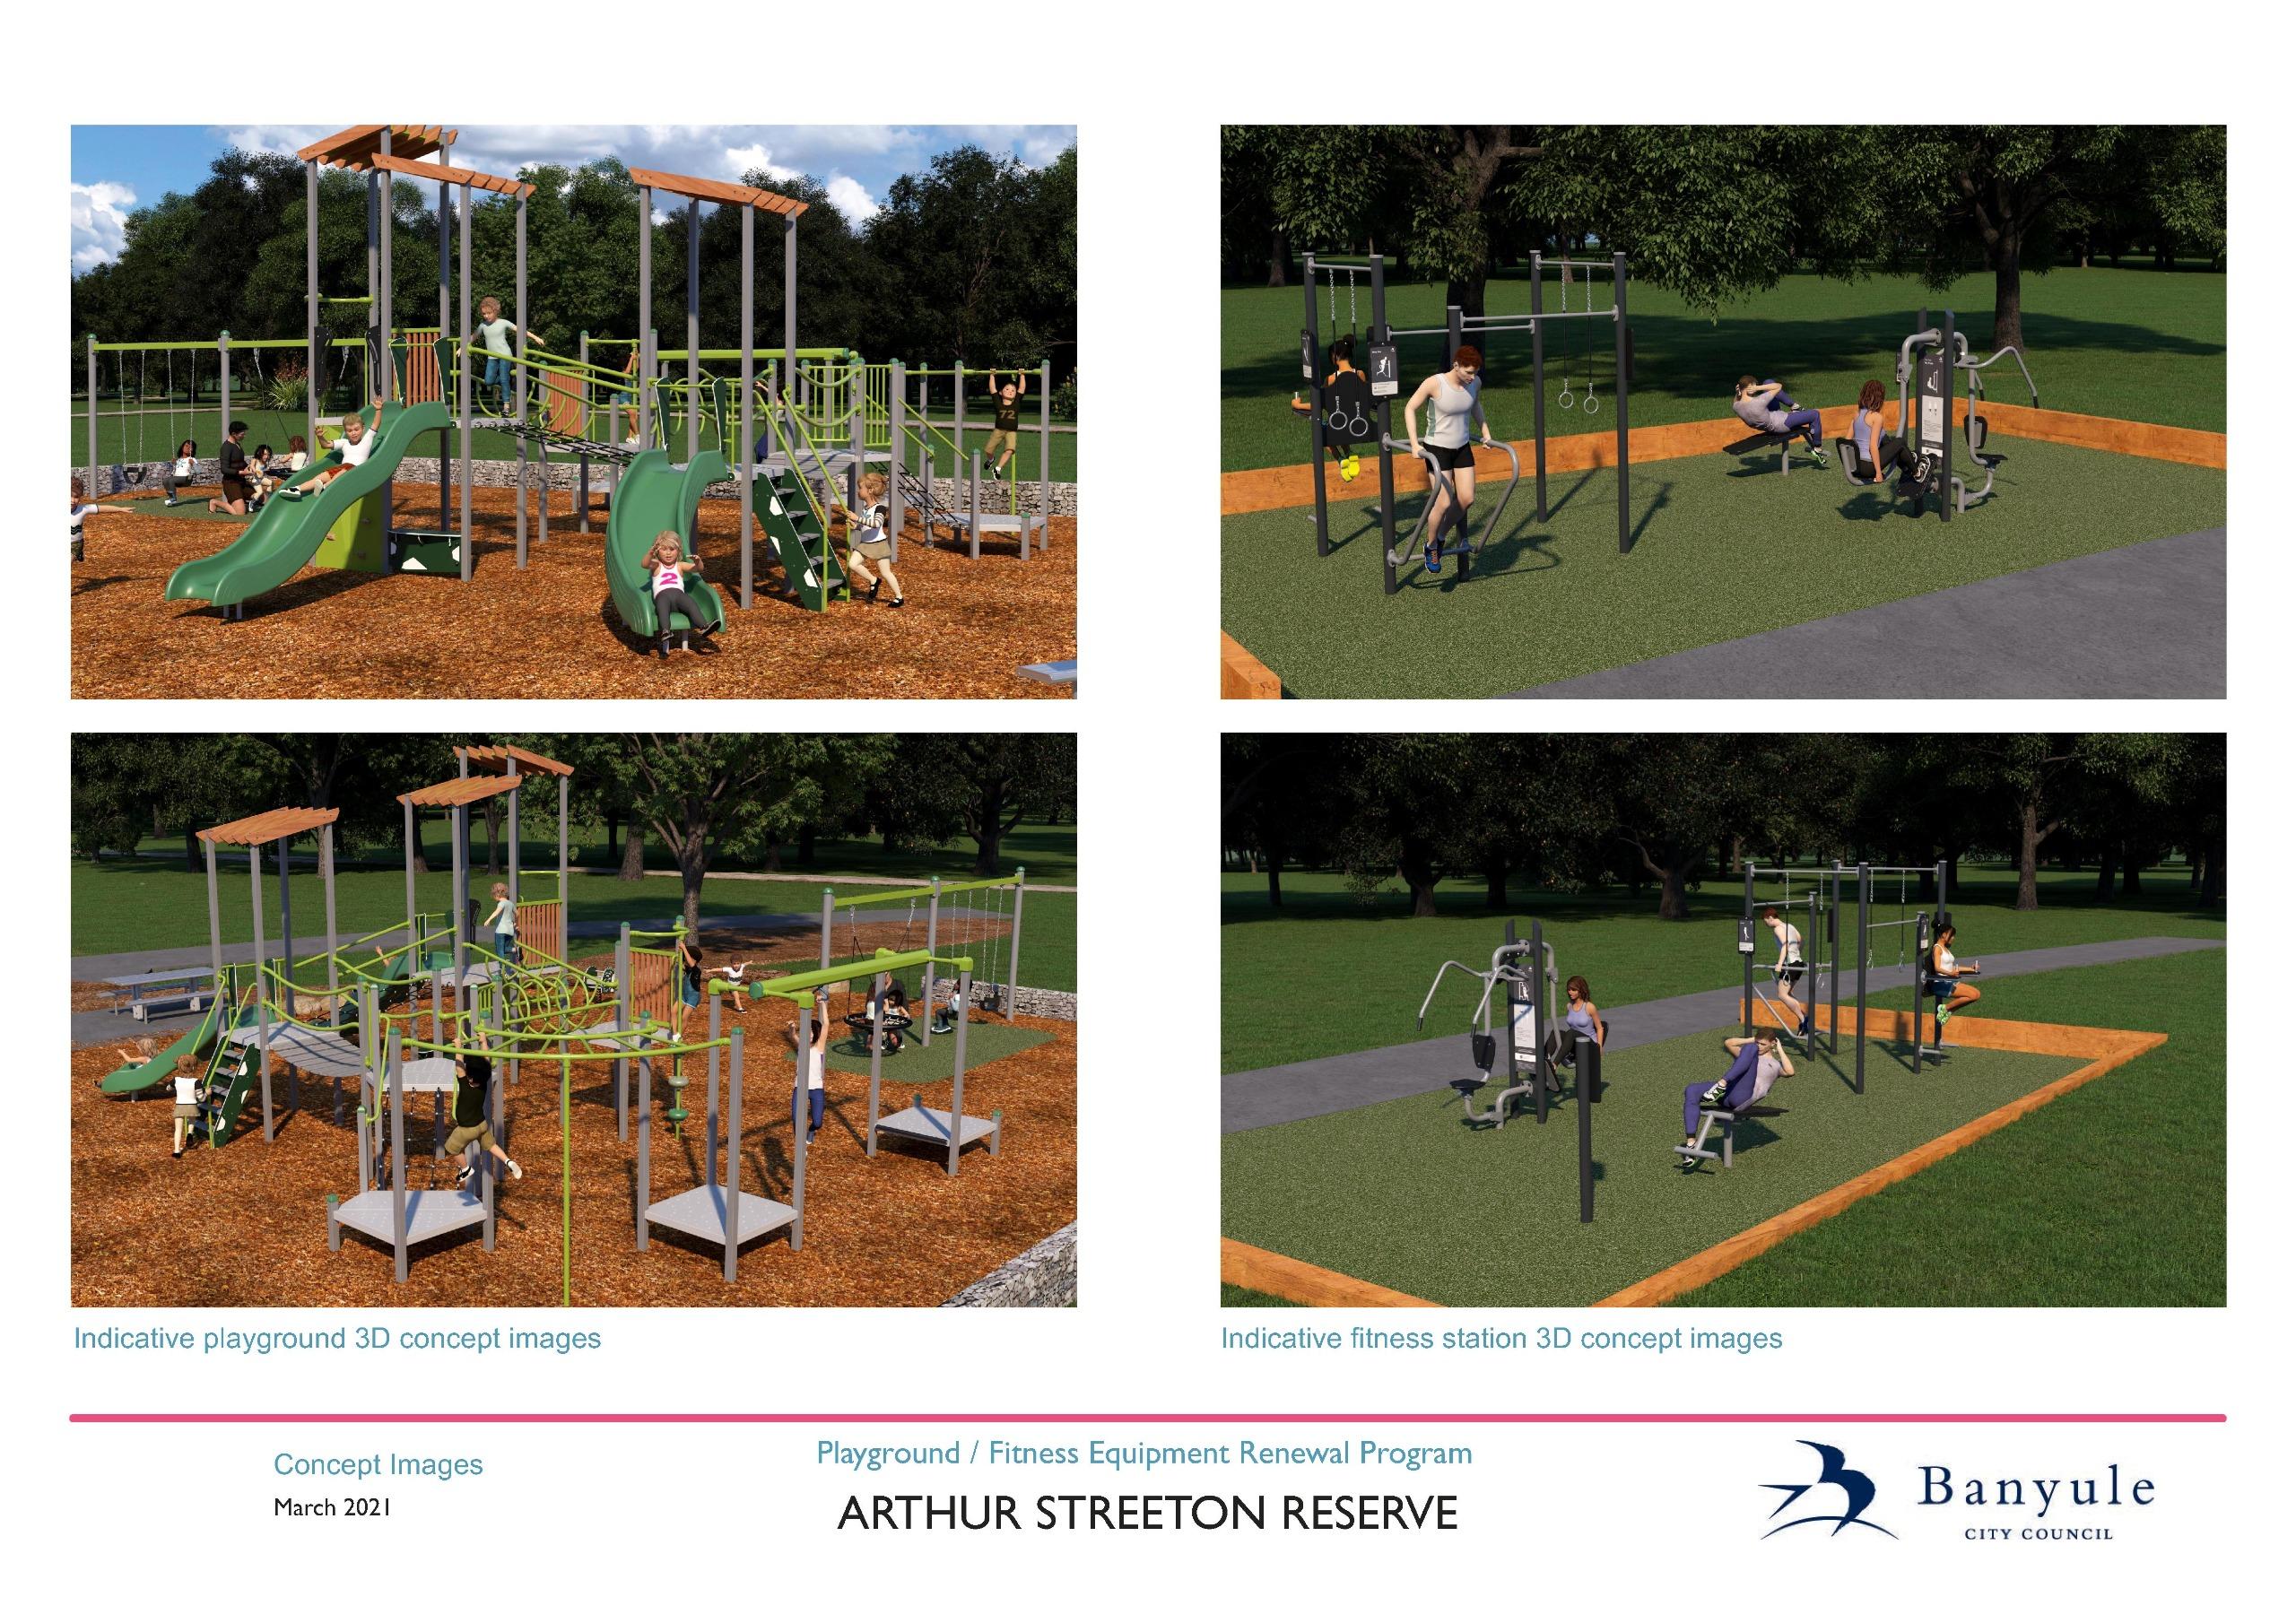 Arthur Streeton Reserve Concept Images